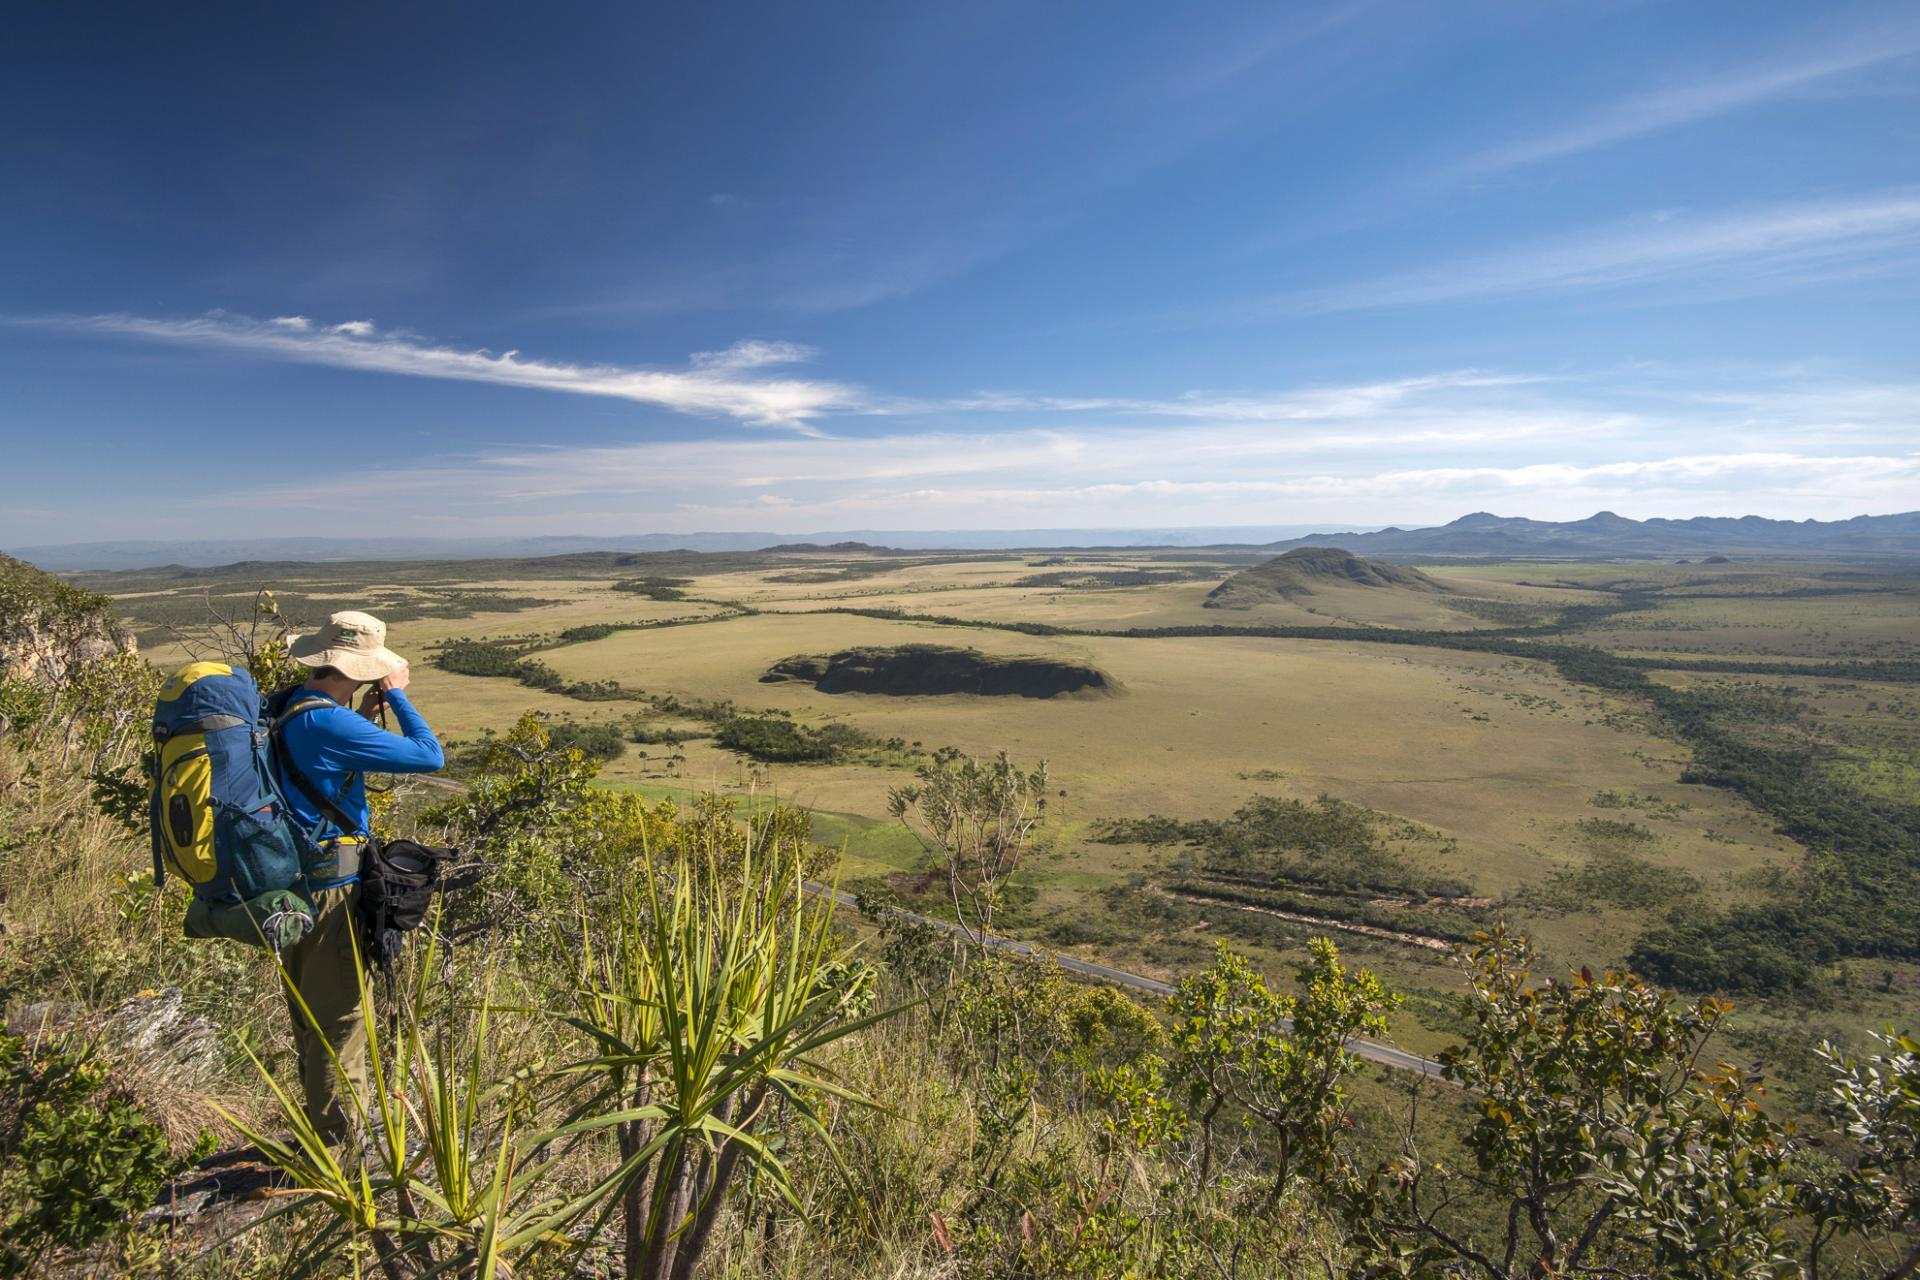 An eco-tourist enjoys the extensive view in Chapada dos Veadeiros.